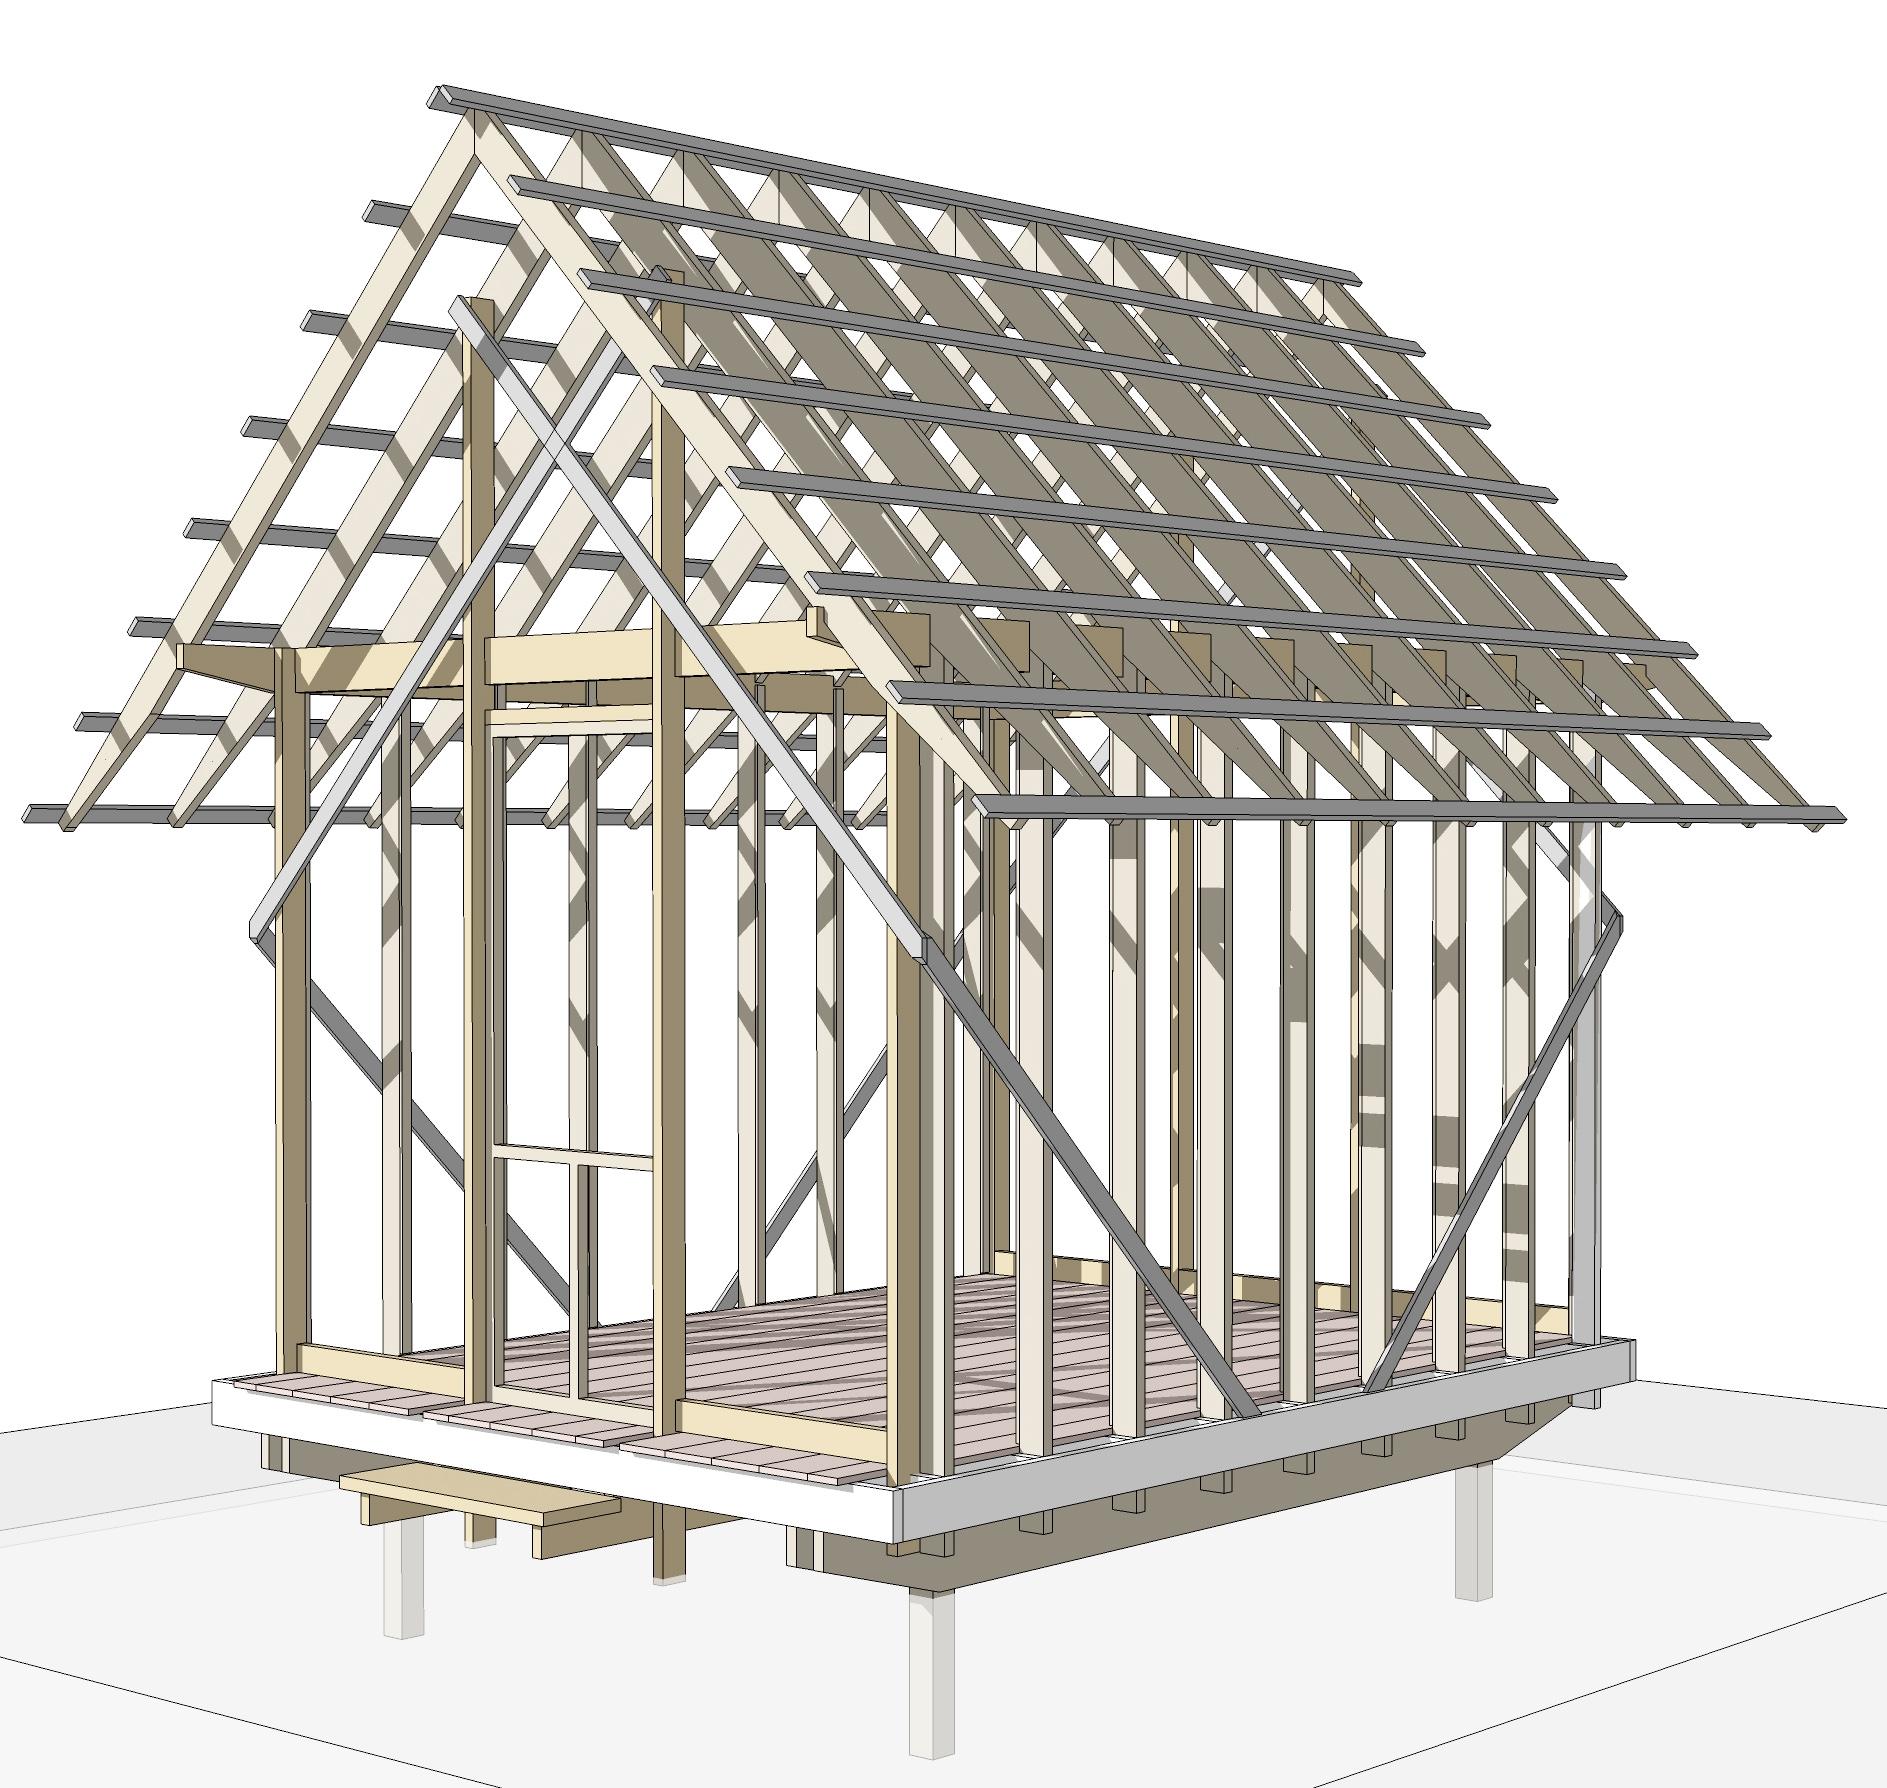 fern house 2.jpg